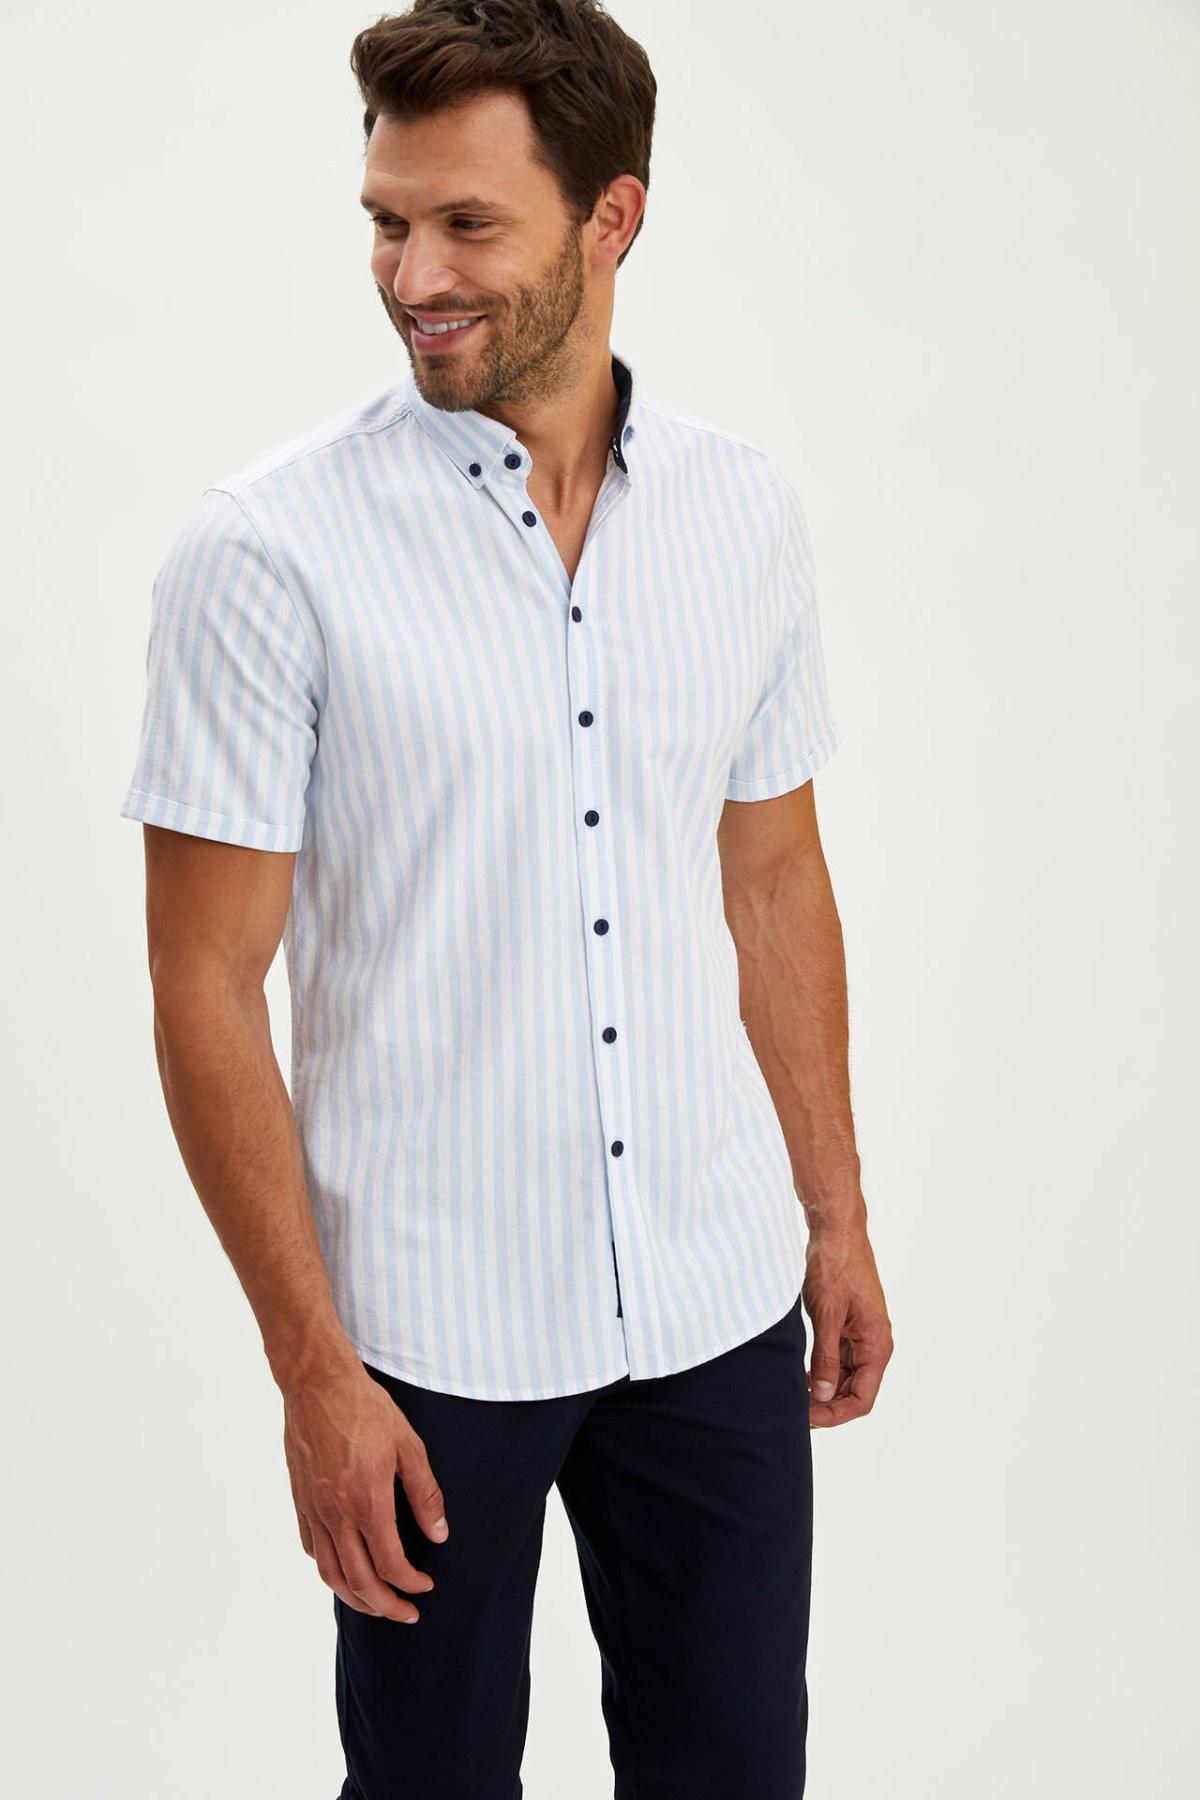 DeFacto Summer Men's Fashion Short Sleeve Shirt Male Casual Striped Comfort Shirts Men High Quality Tops New - L1895AZ19SM